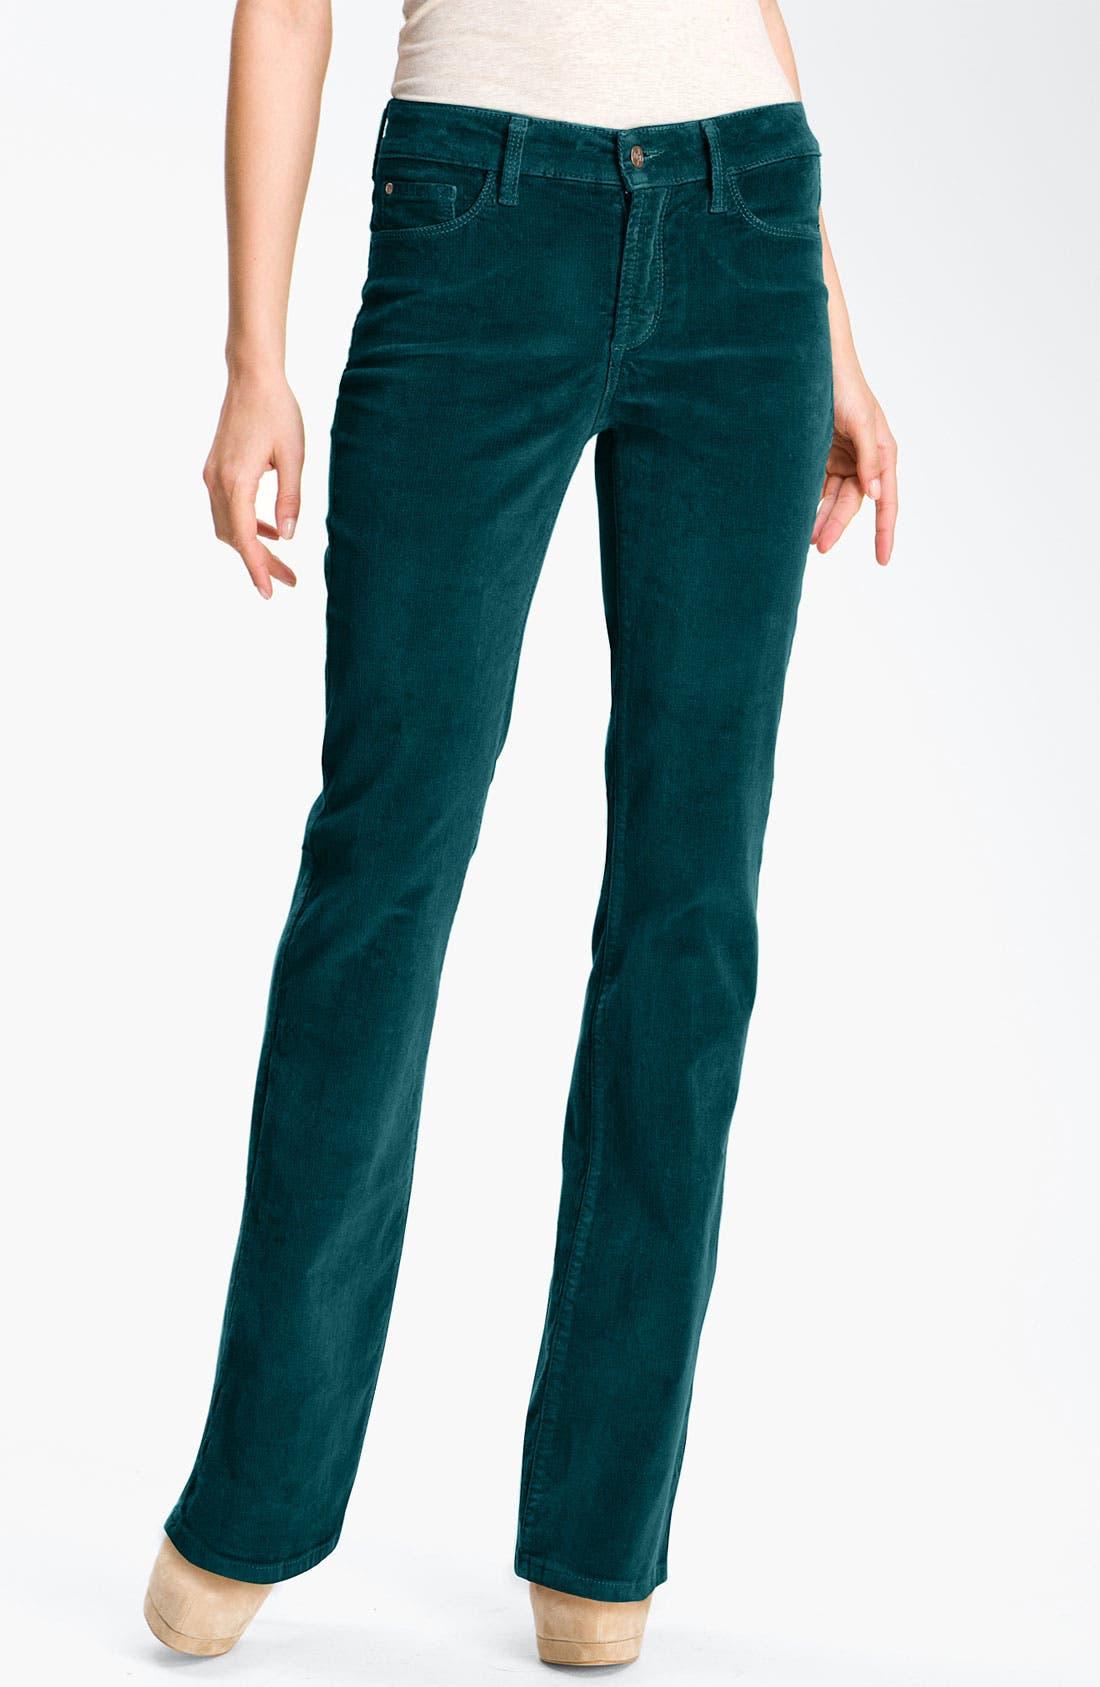 Alternate Image 1 Selected - NYDJ Bootcut Corduroy Jeans